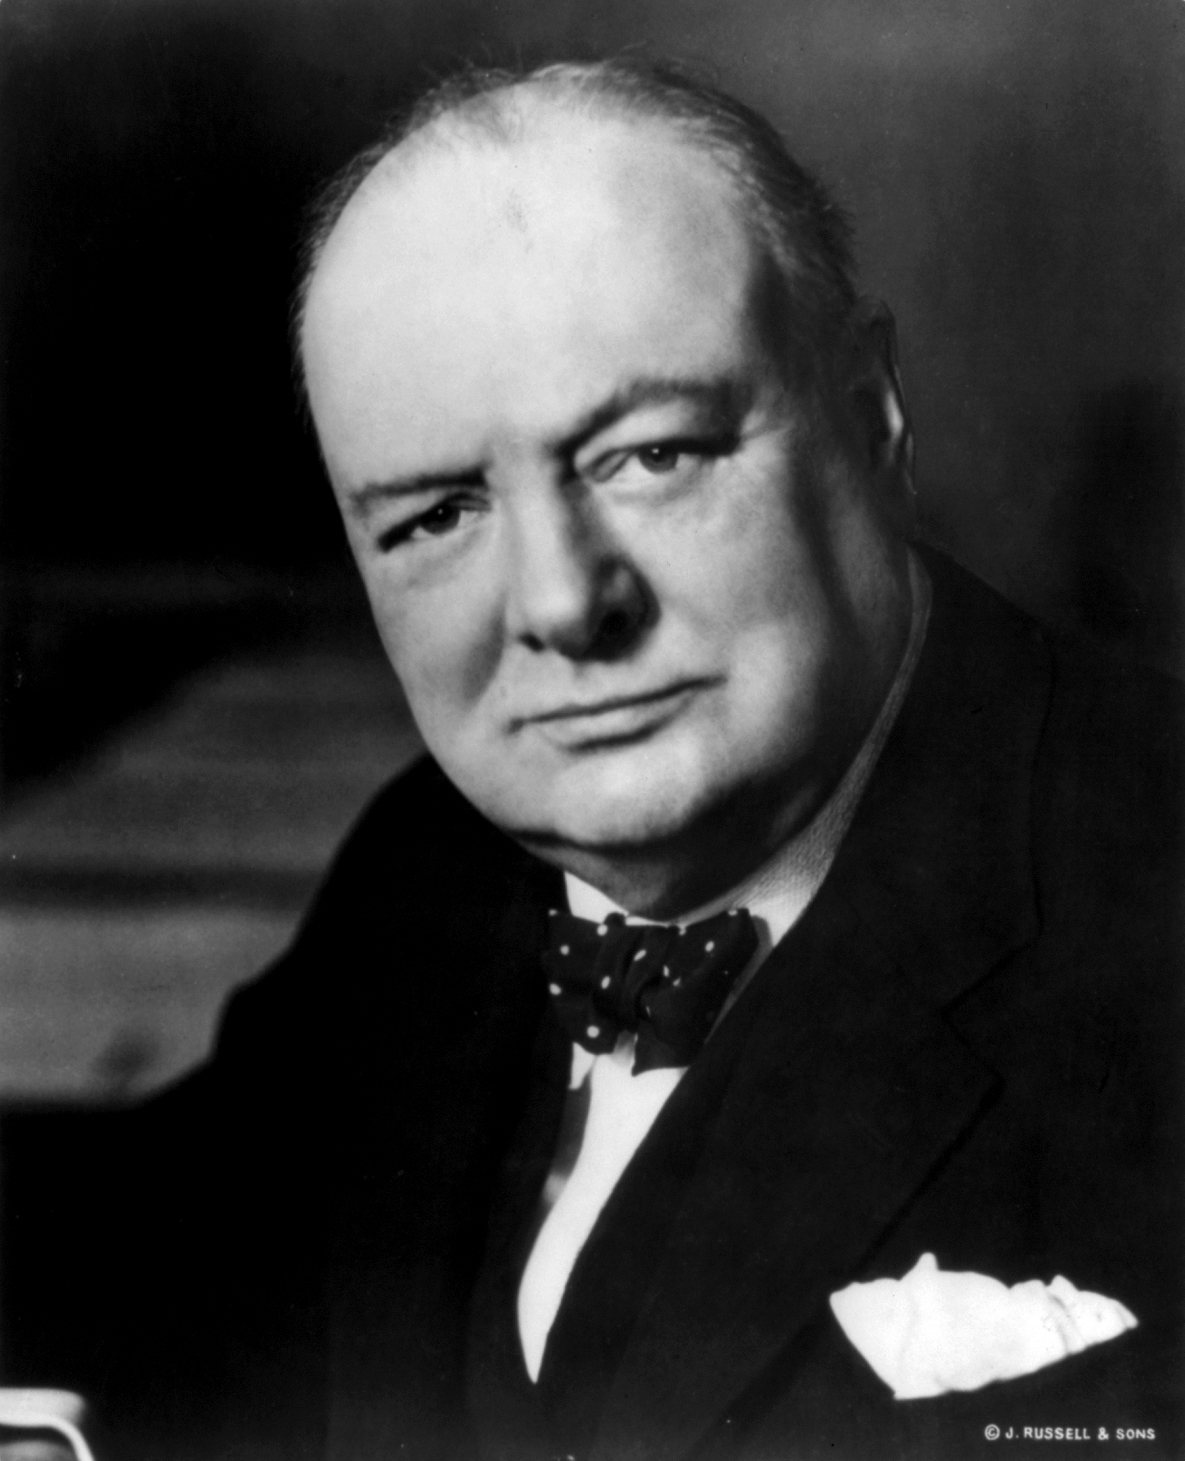 Winston Churchill cph.3a49758